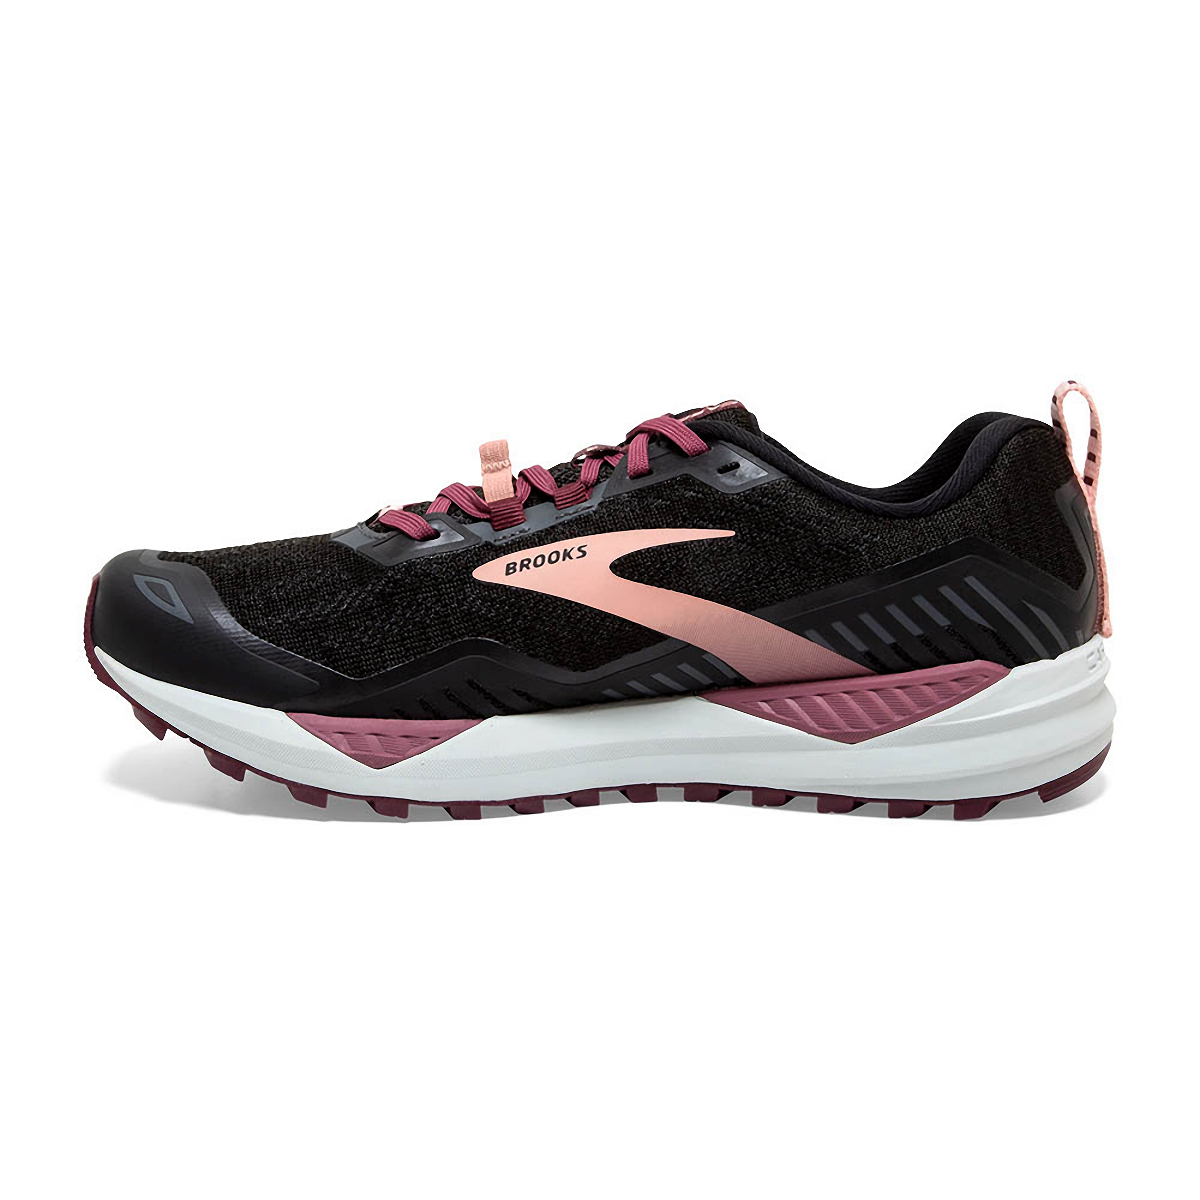 Women's Brooks Cascadia 15 Trail Running Shoe - Color: Black/Ebony/Coral - Size: 10.5 - Width: Regular, Black/Ebony/Coral, large, image 2